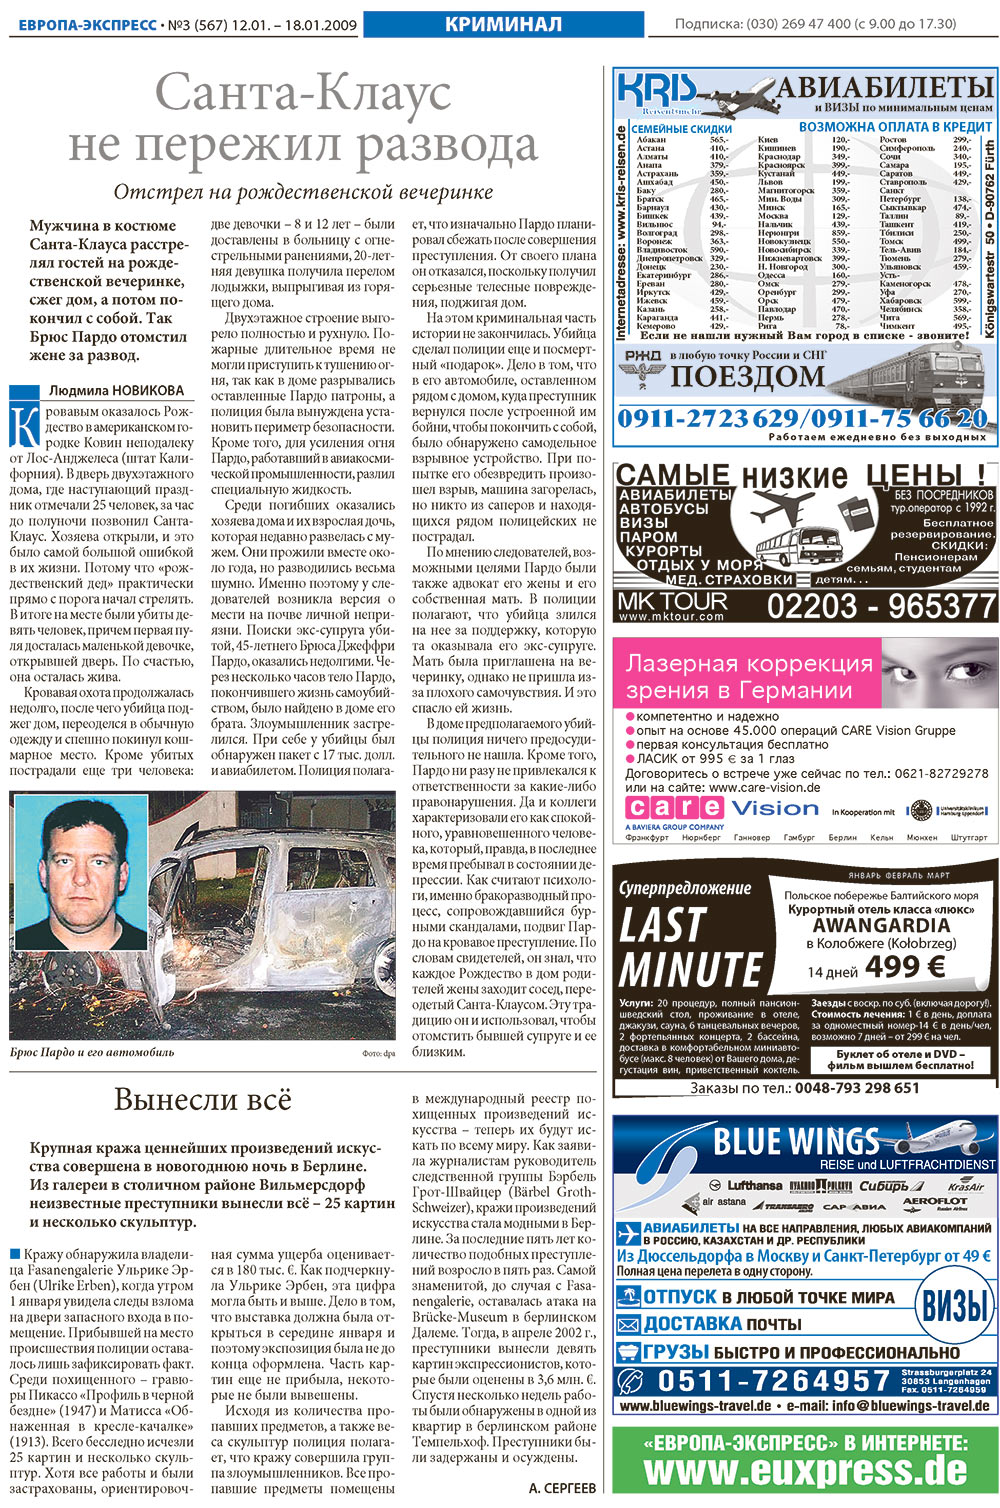 Европа экспресс (газета). 2009 год, номер 1, стр. 22